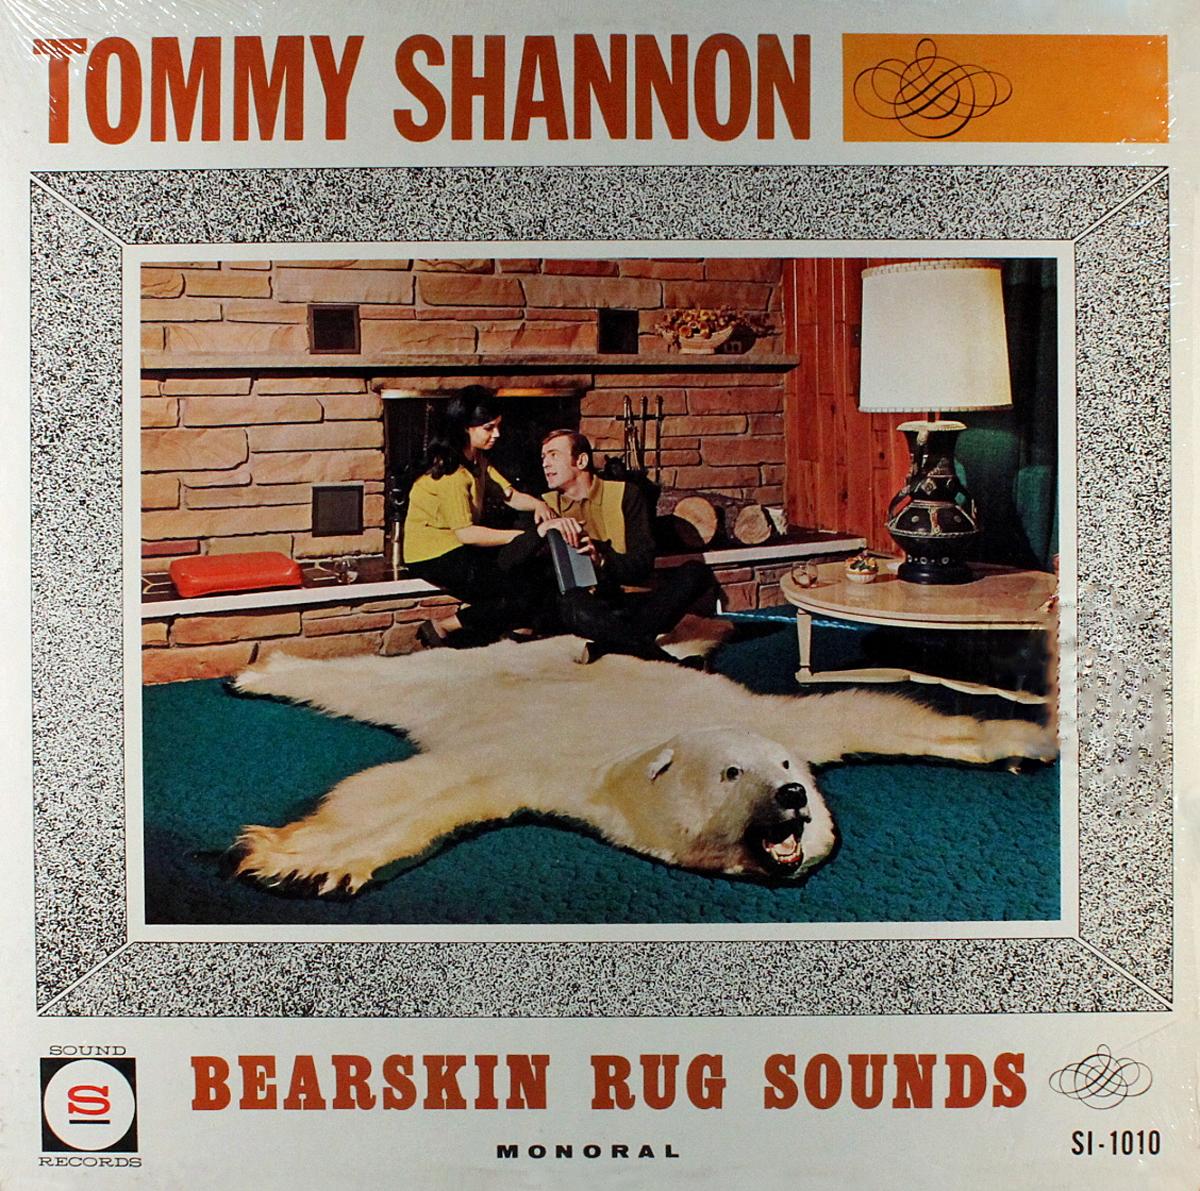 Tom Shannon Bearskin Rug ('65) LP Cover (MCRFB)